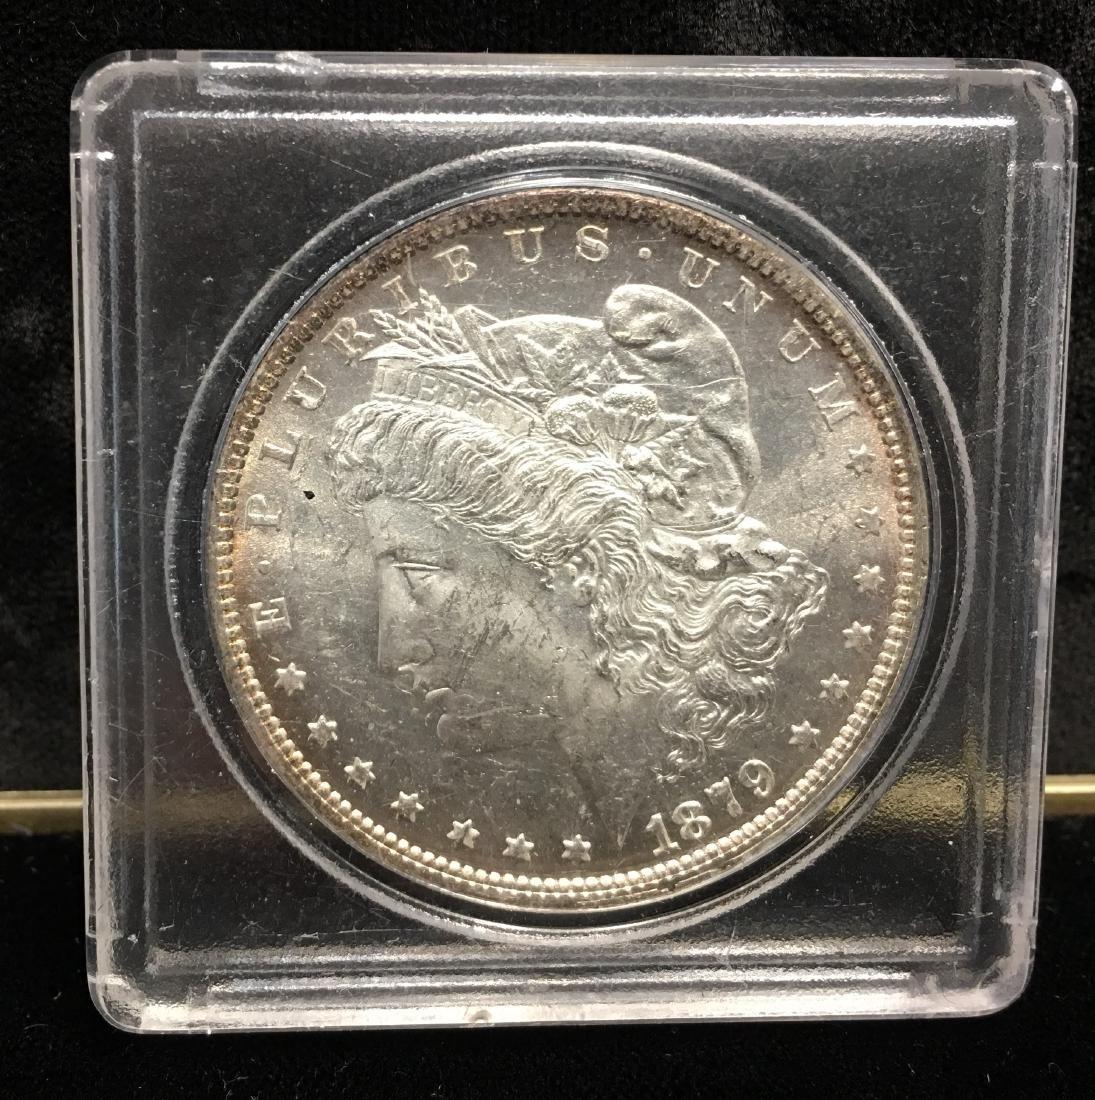 1879-O $1 Morgan Silver Dollar Proof Like